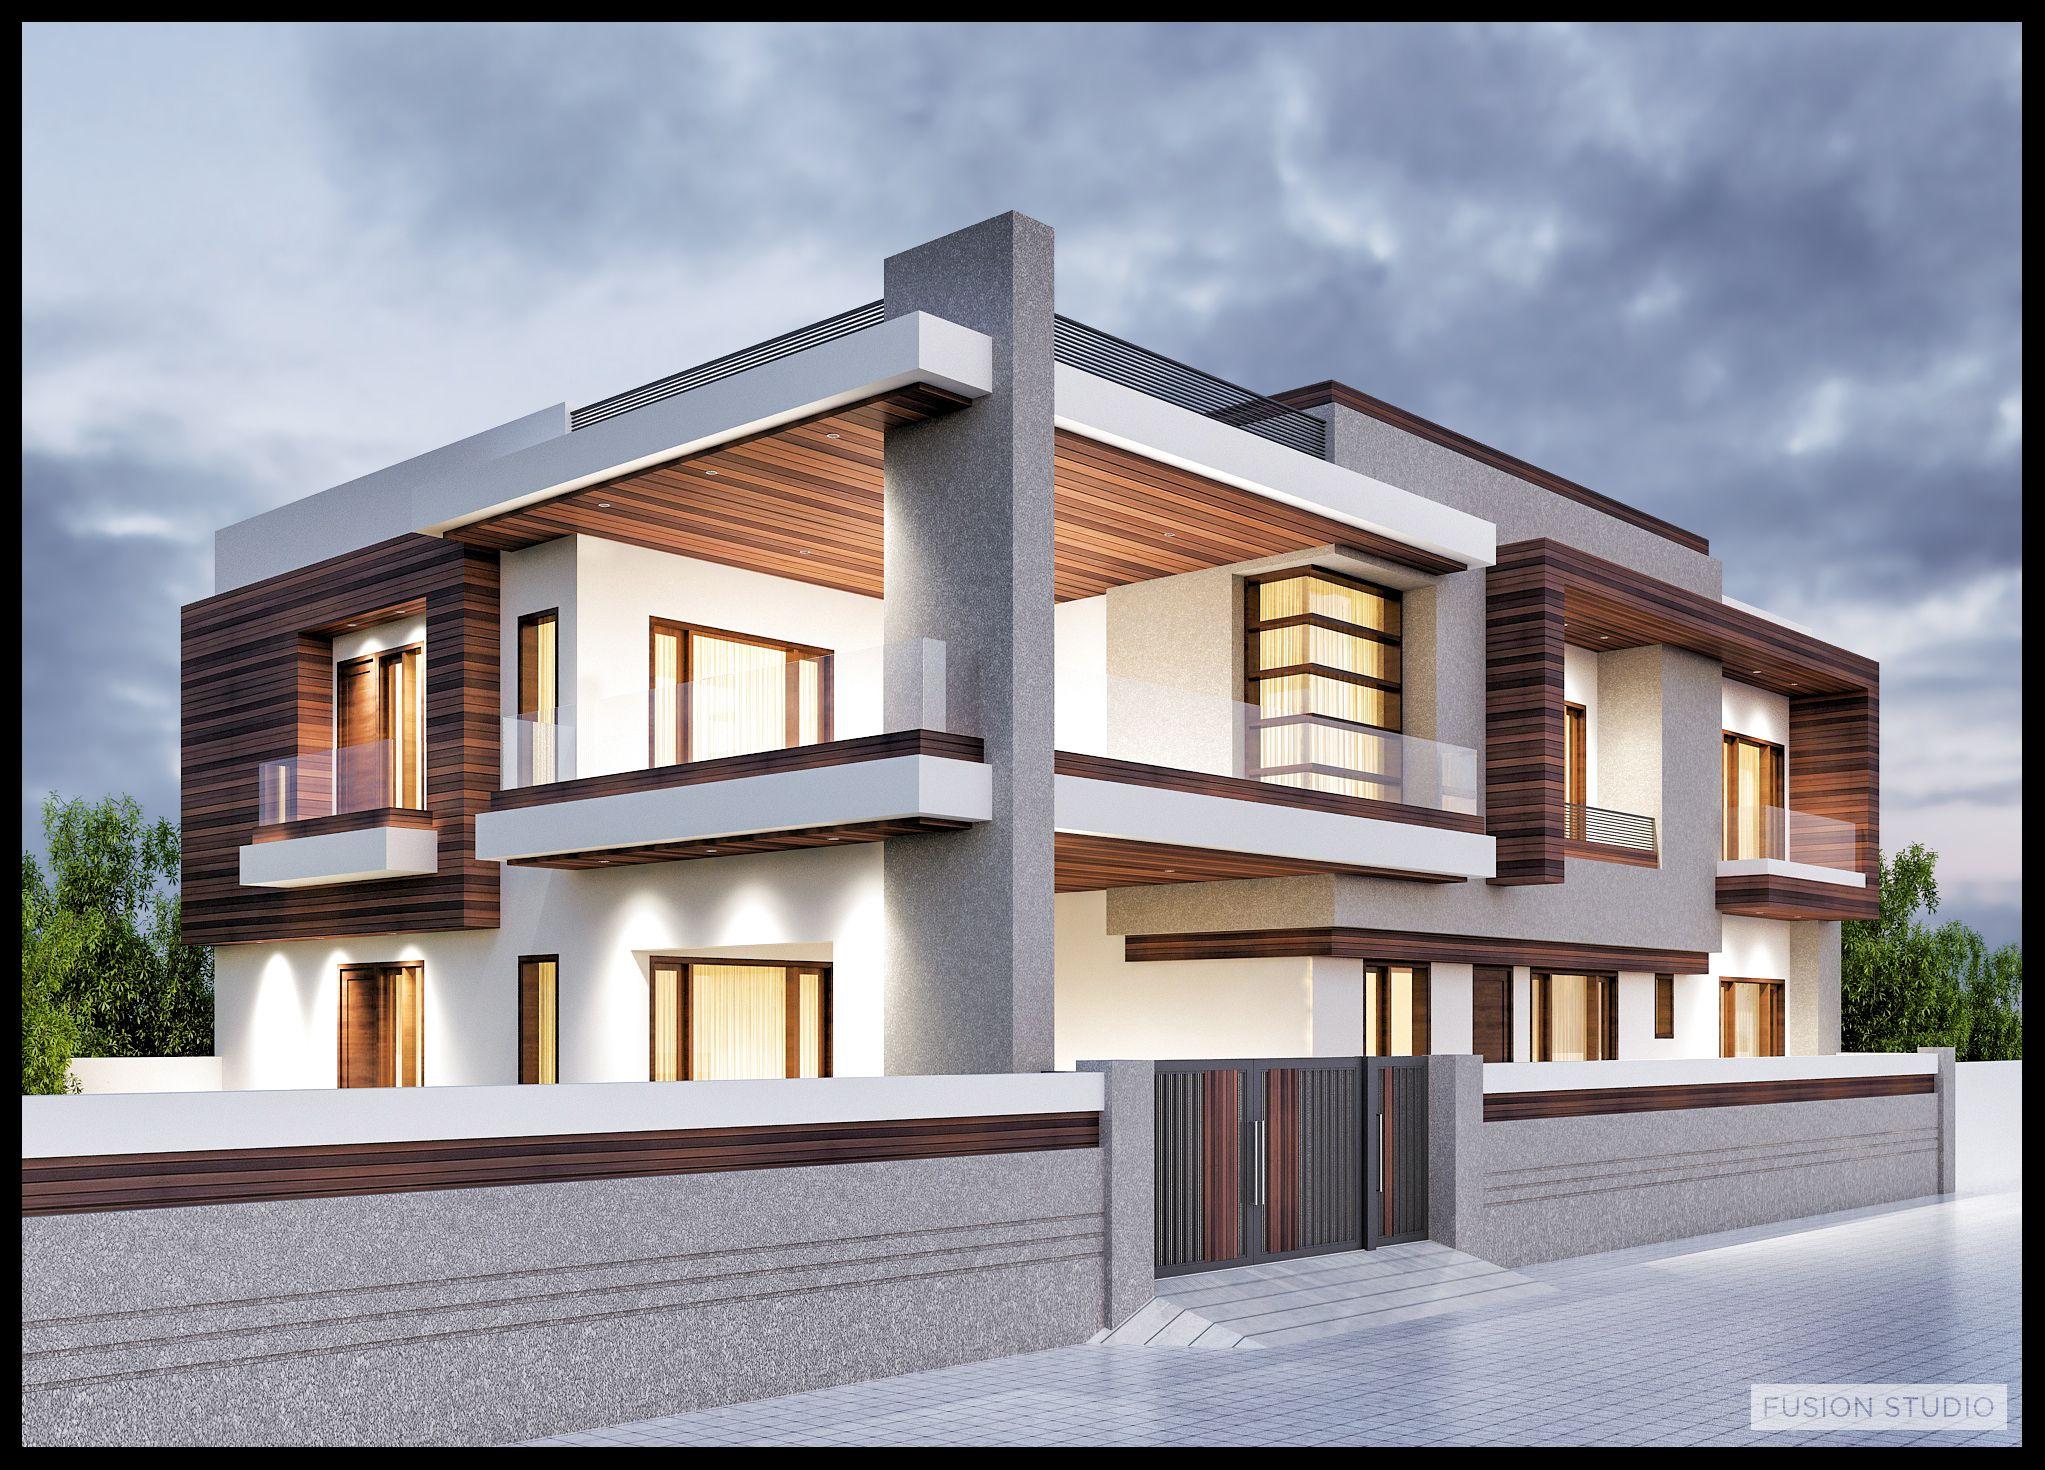 Architectural previsualization renders | Haus Fassade | Pinterest ...